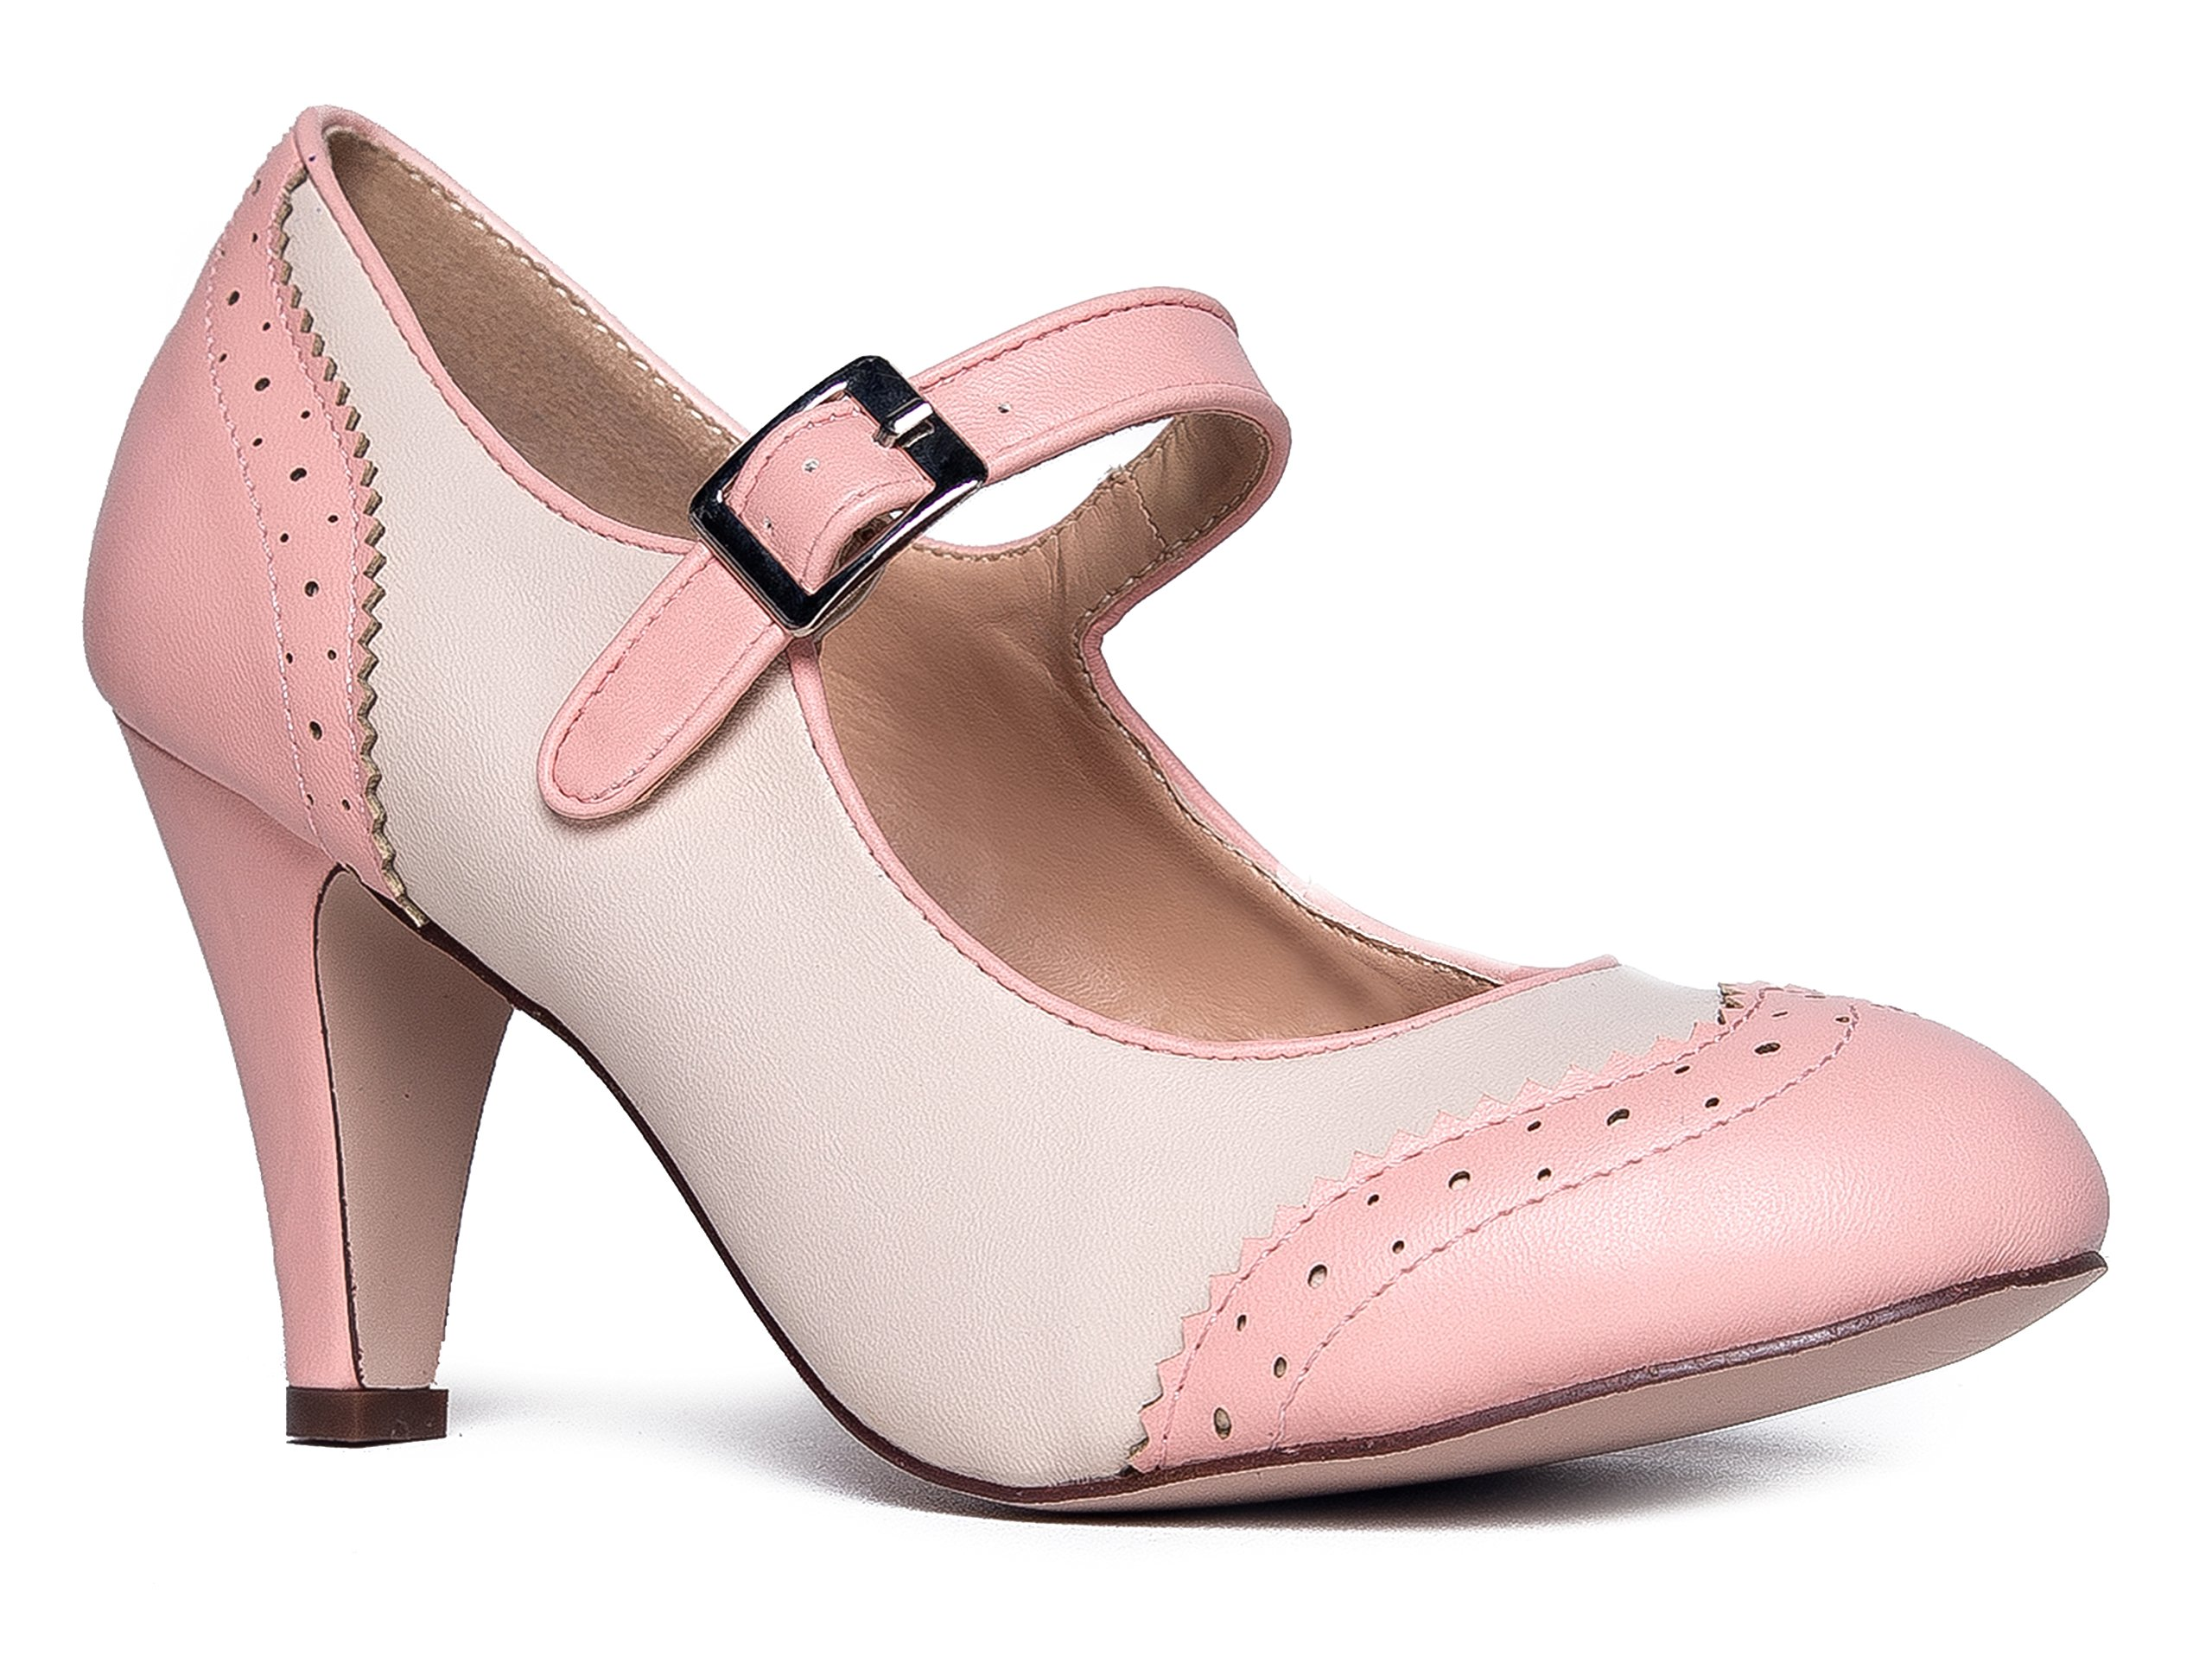 Kym Round Toe Oxford Heel, Pink Cream PU, 10 B(M) US